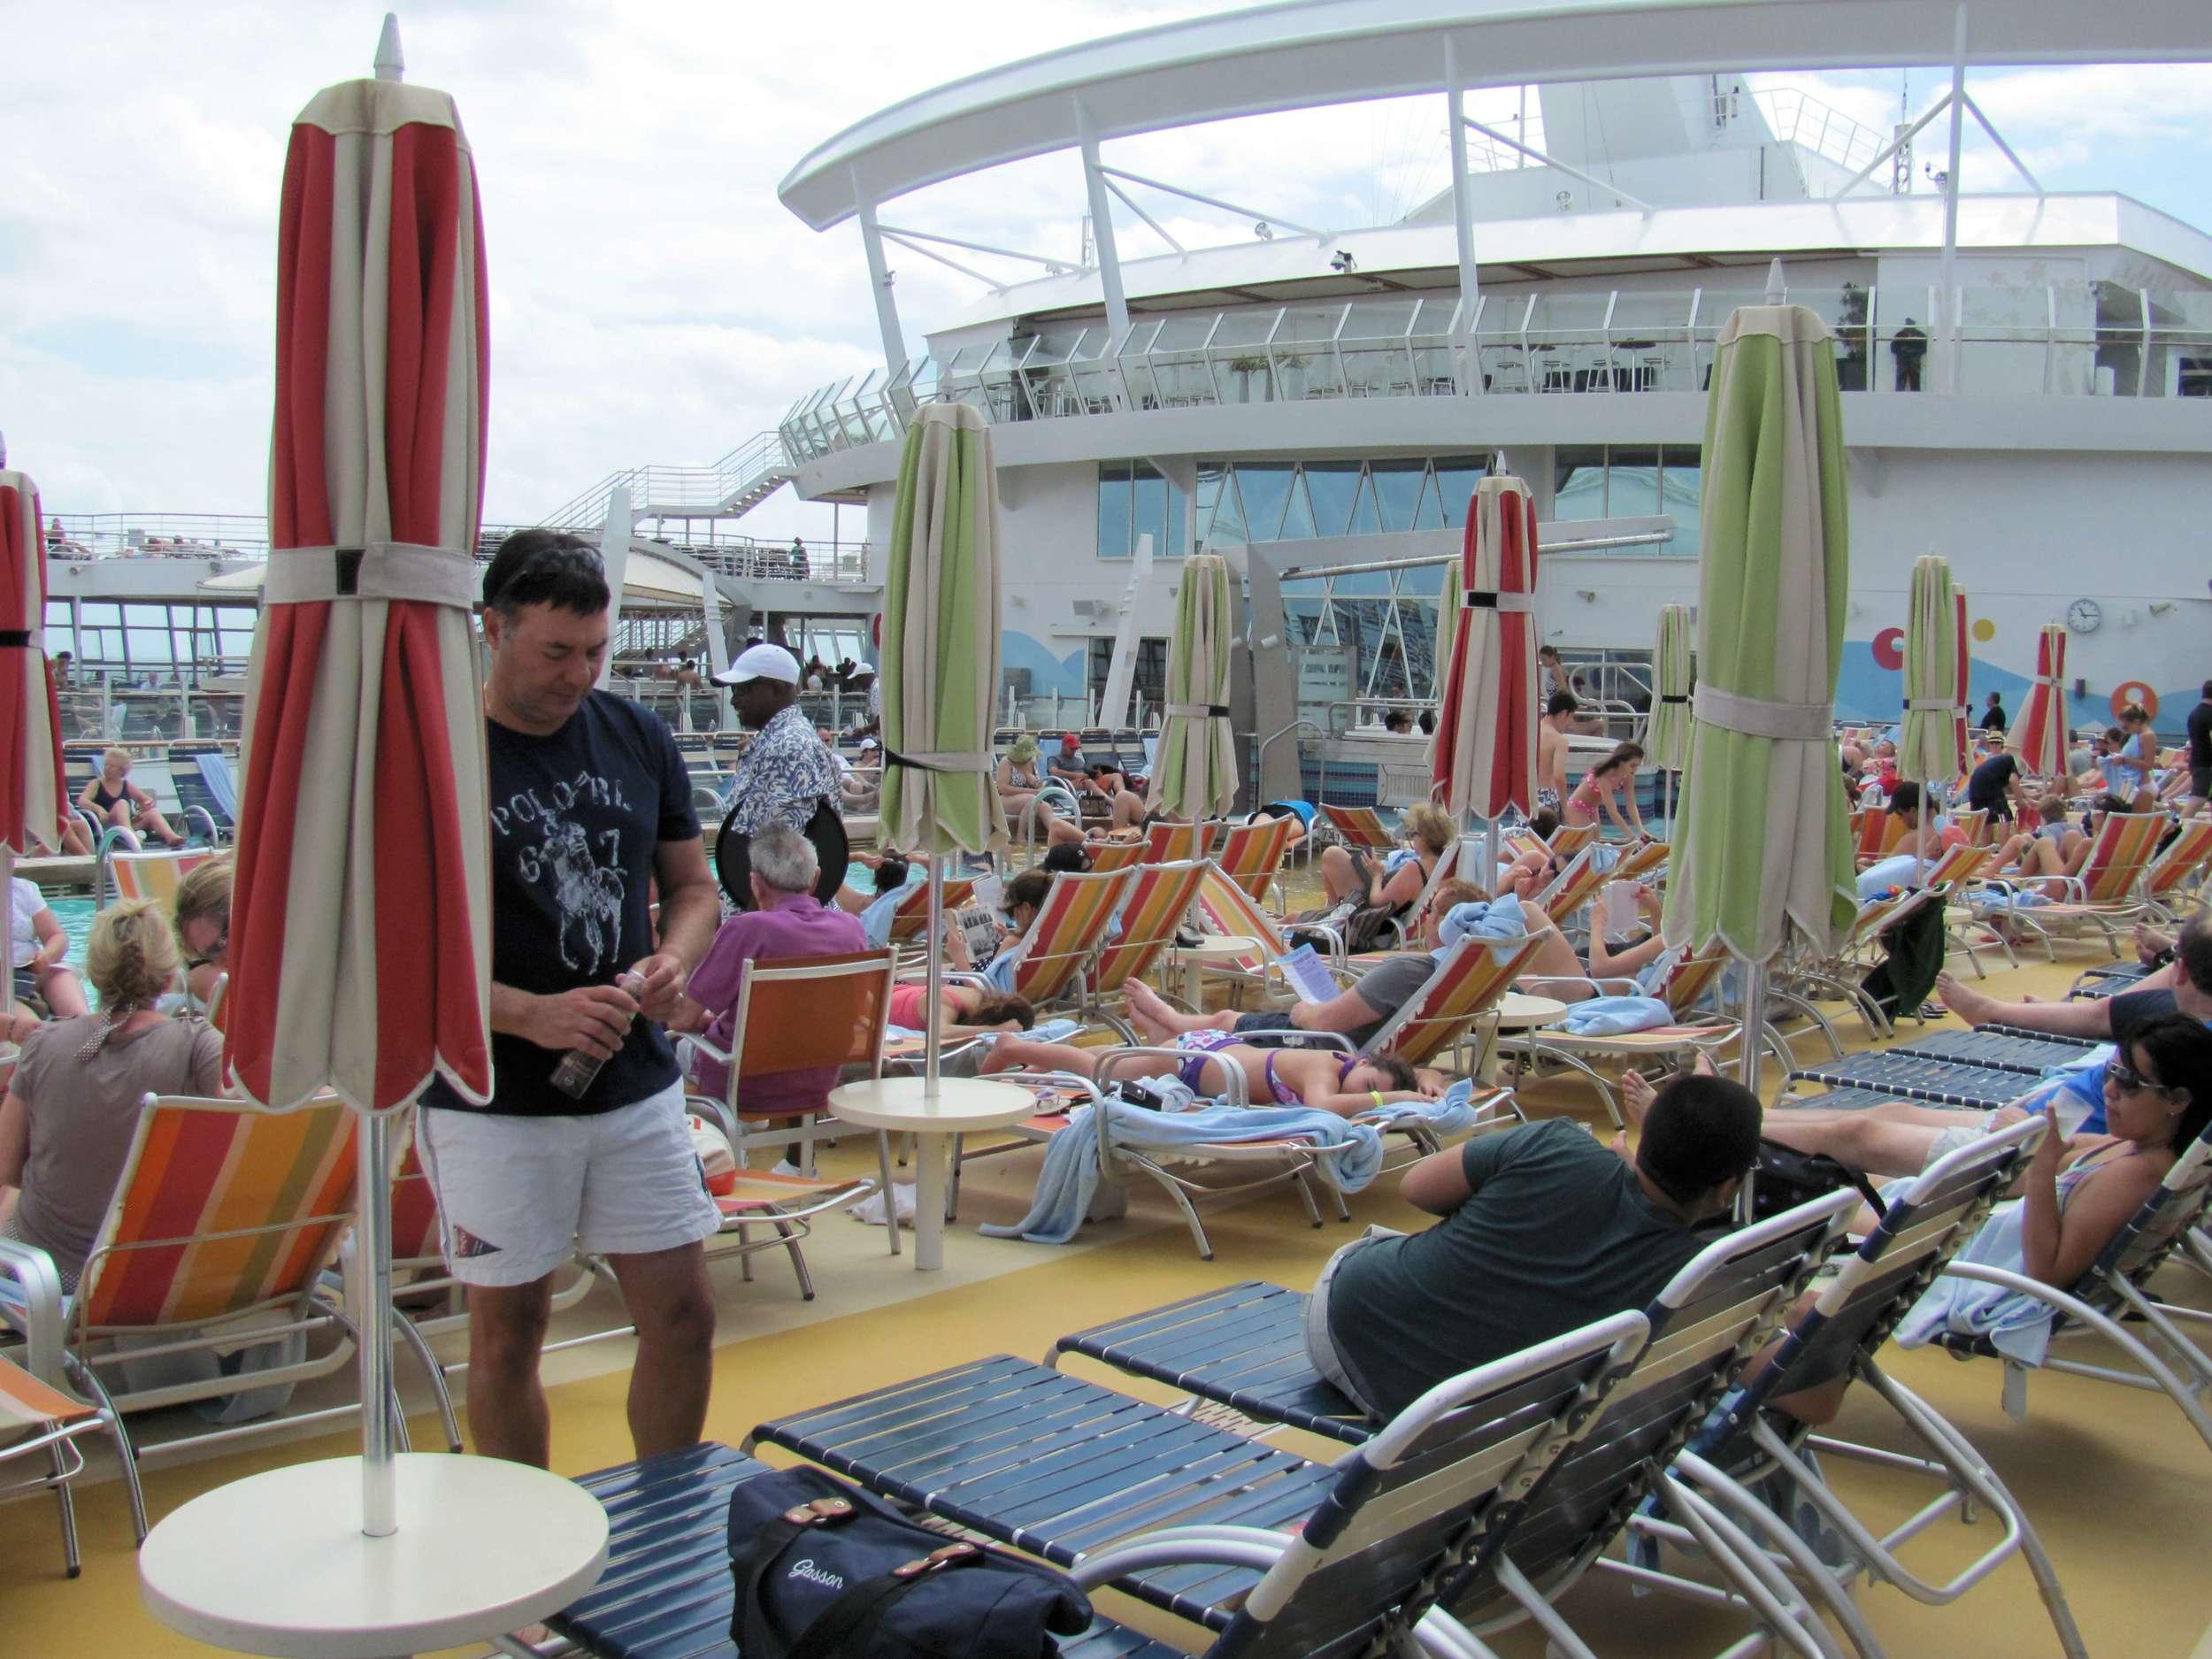 2012-04-15 Oasis of the Seas (3)-4000